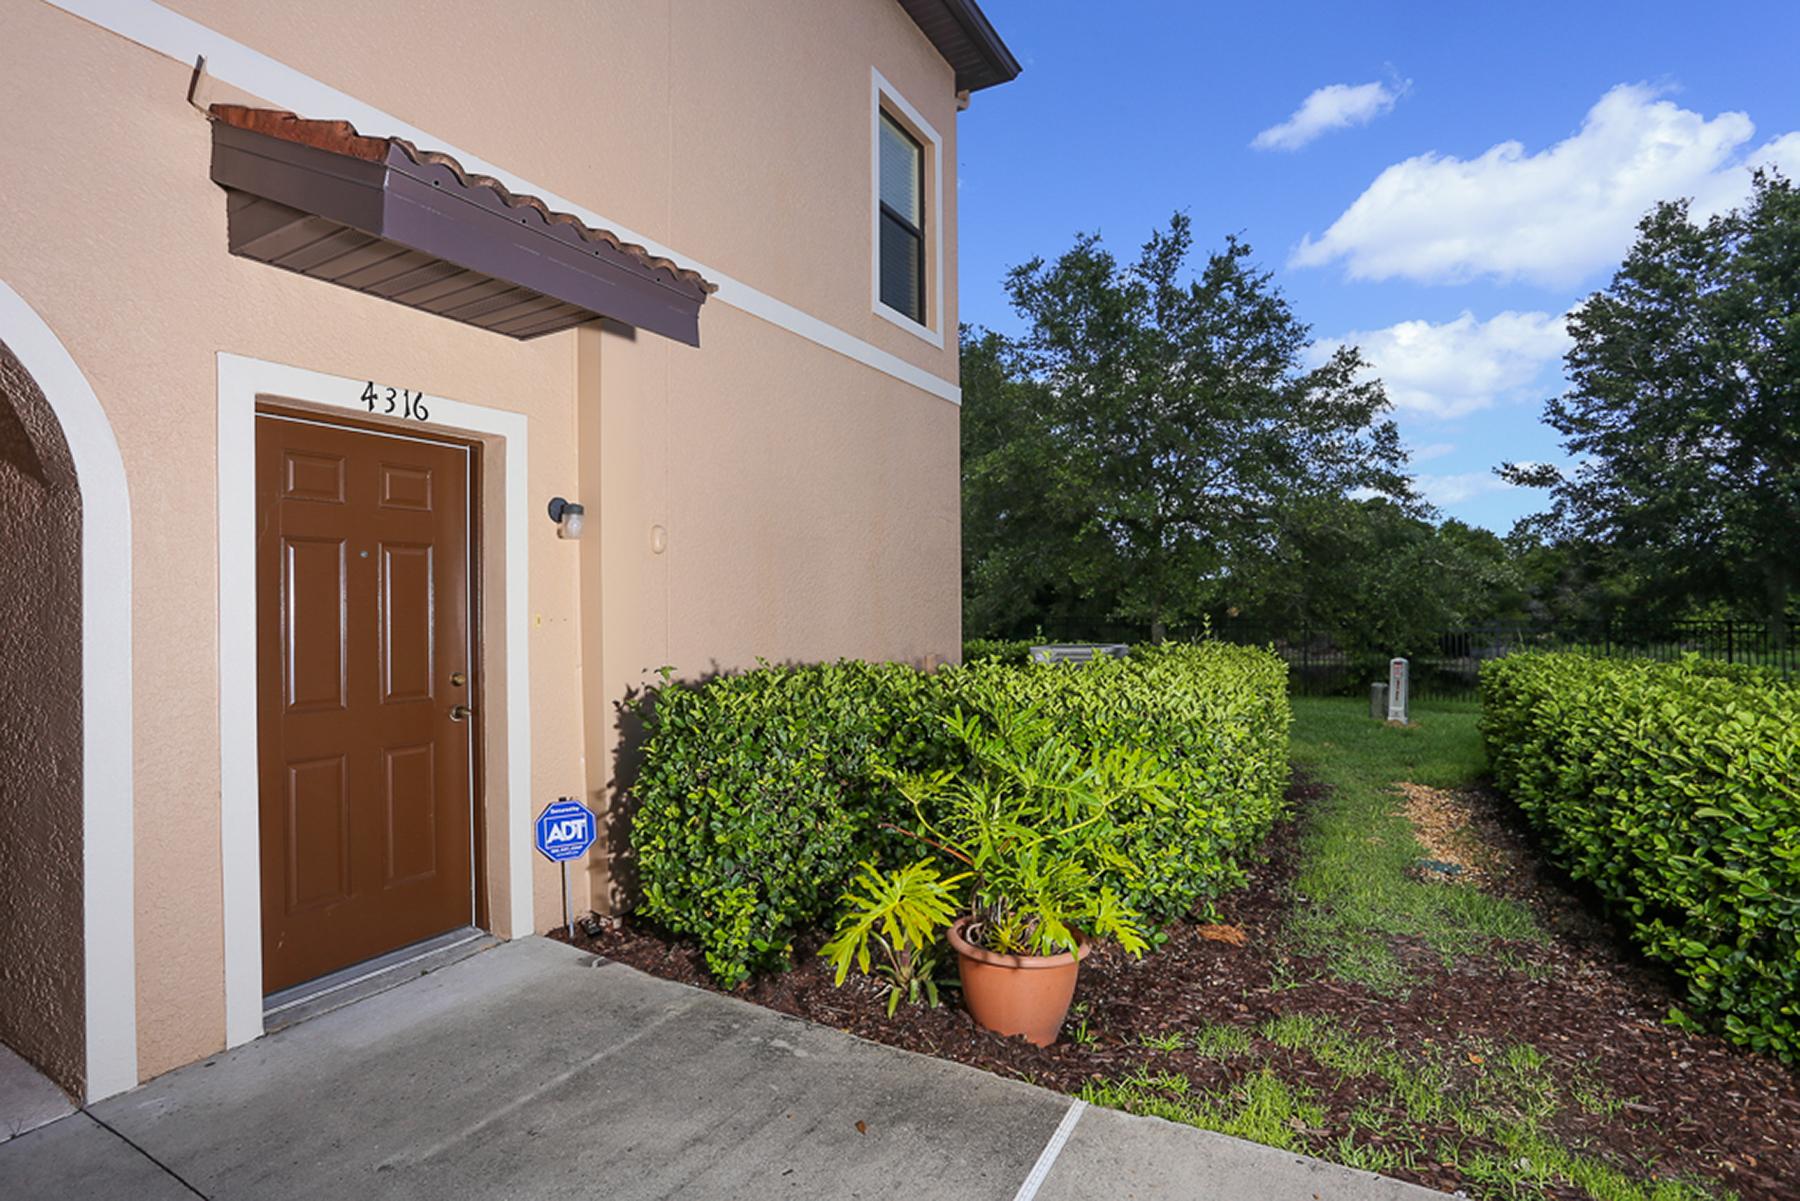 Condominio por un Alquiler en SARASOTA - STONERIDGE 4316 Via Piedra Cir Sarasota, Florida 34233 Estados Unidos